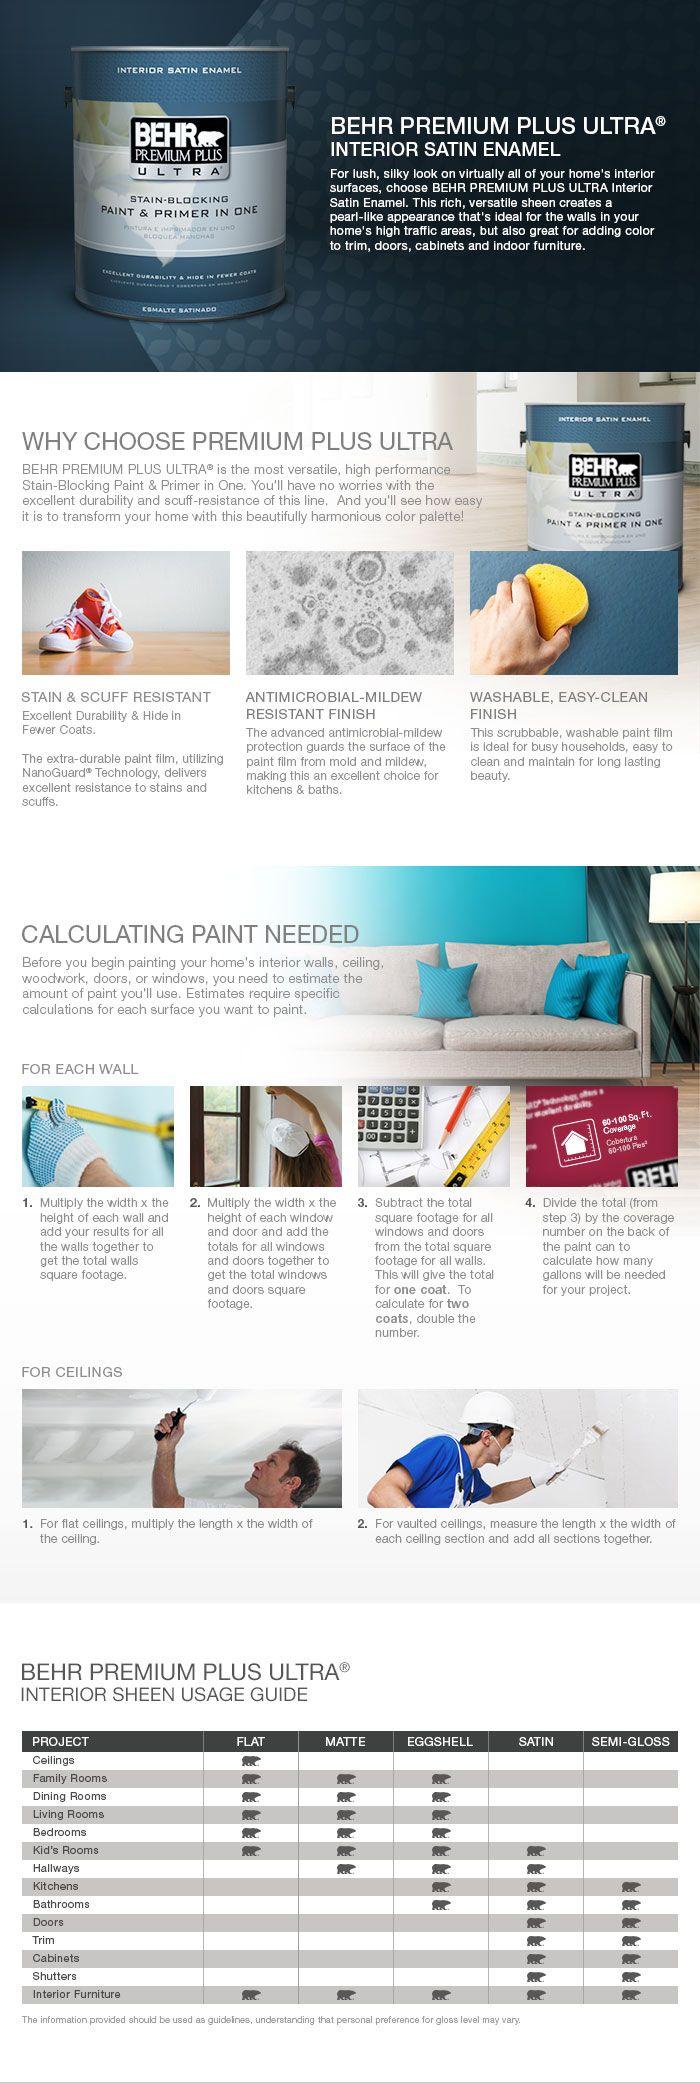 Behr Premium Plus Ultra 8 Oz Gr W09 Snowfall White Satin Enamel Interior Exterior Paint And Primer In One Sample Interior Paint Behr White Ceiling Paint